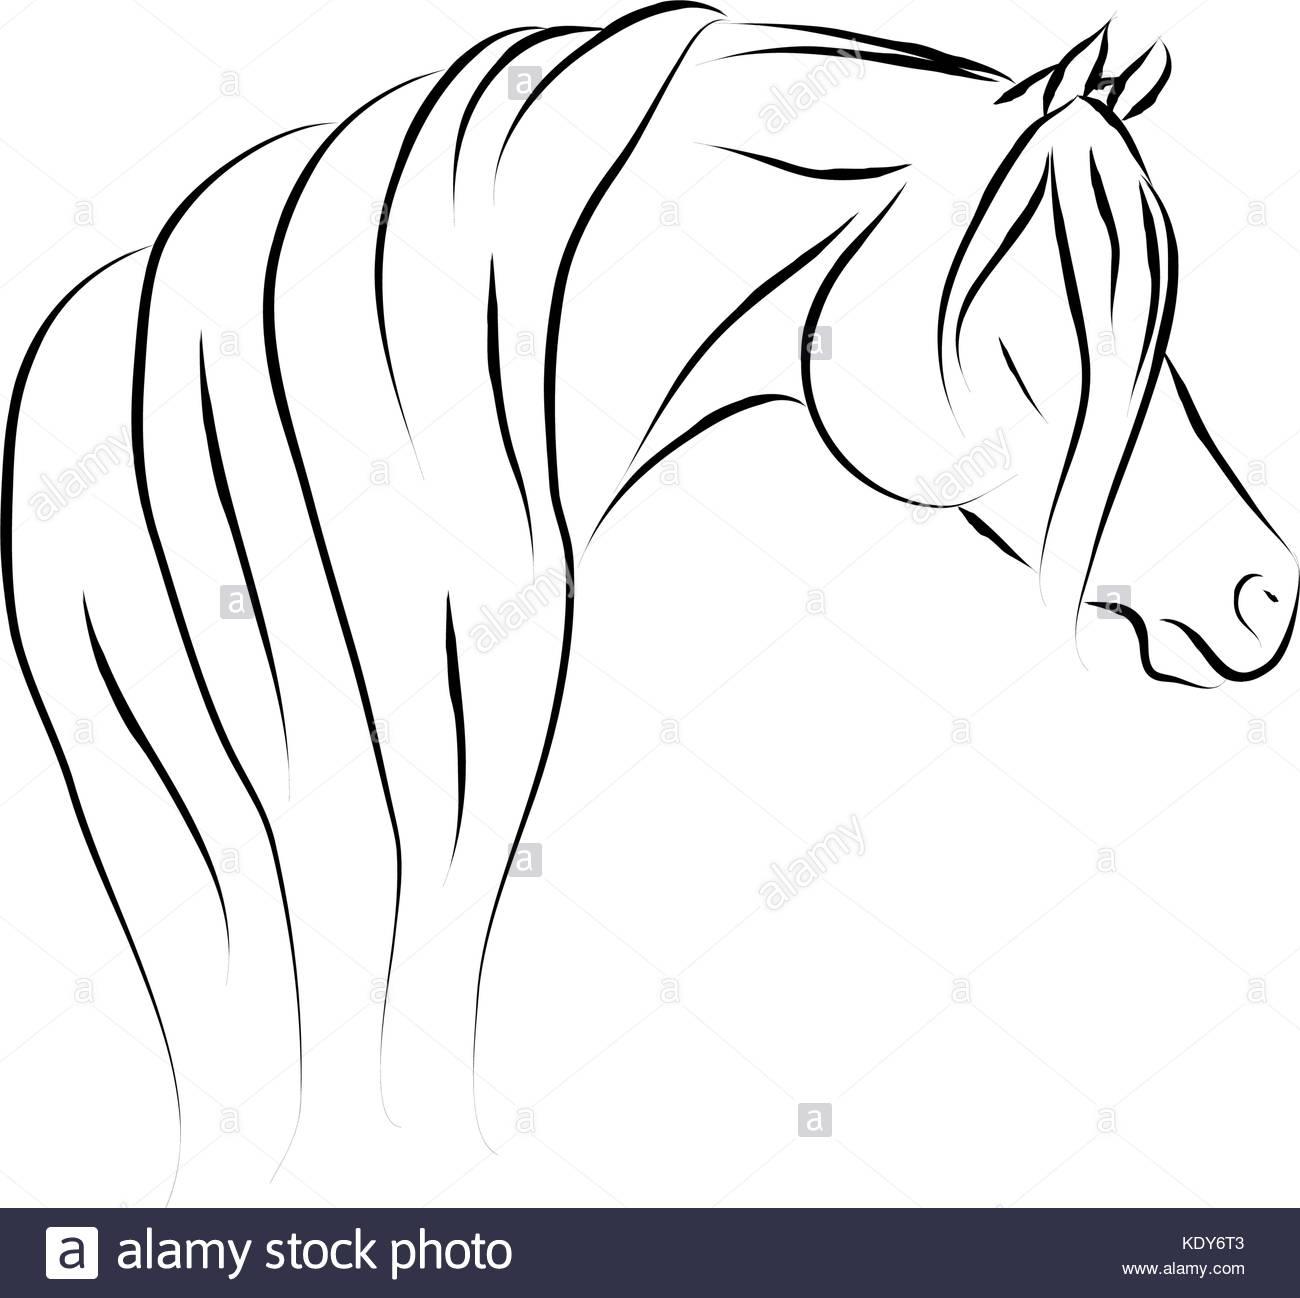 1300x1298 Purebred Arabian Horse Stock Vector Images